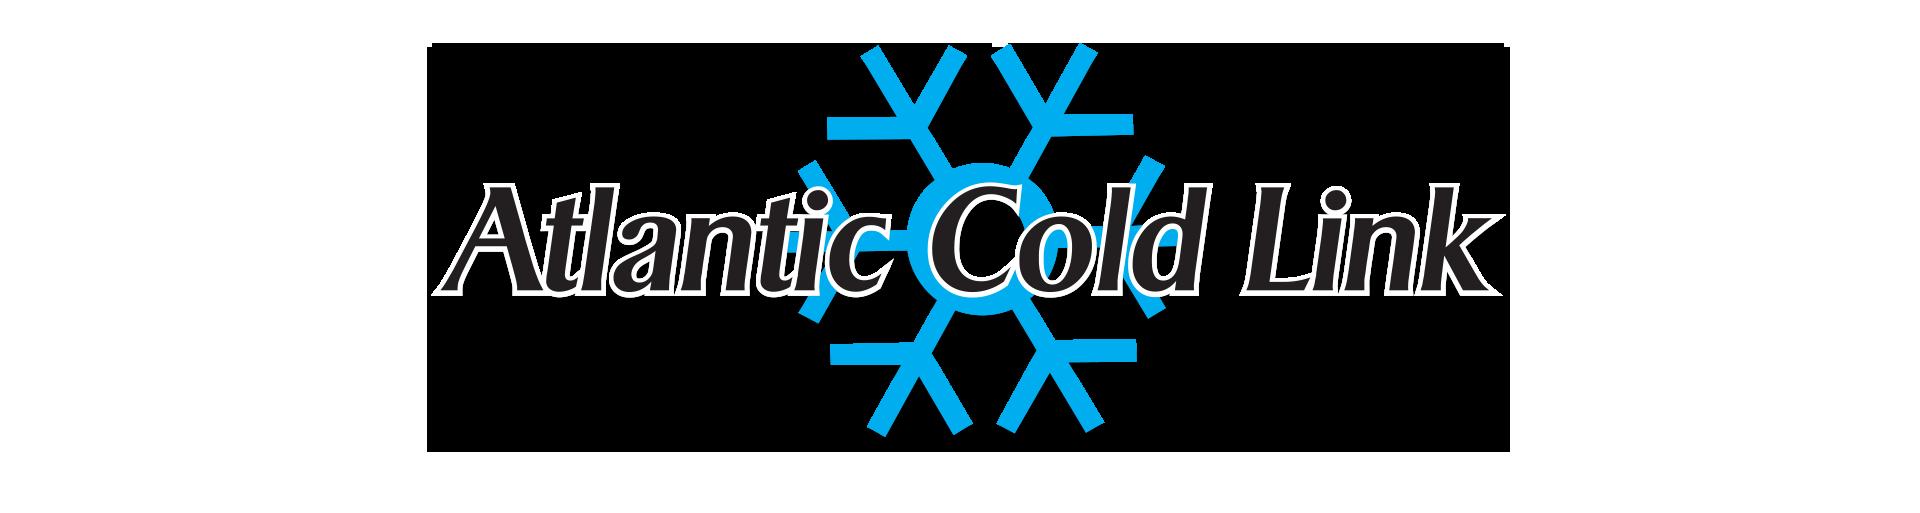 Prosperita Commercial Cold Store  sc 1 st  Prosperita Commercial Cold Store & ACCS « Prosperita Commercial Cold Store